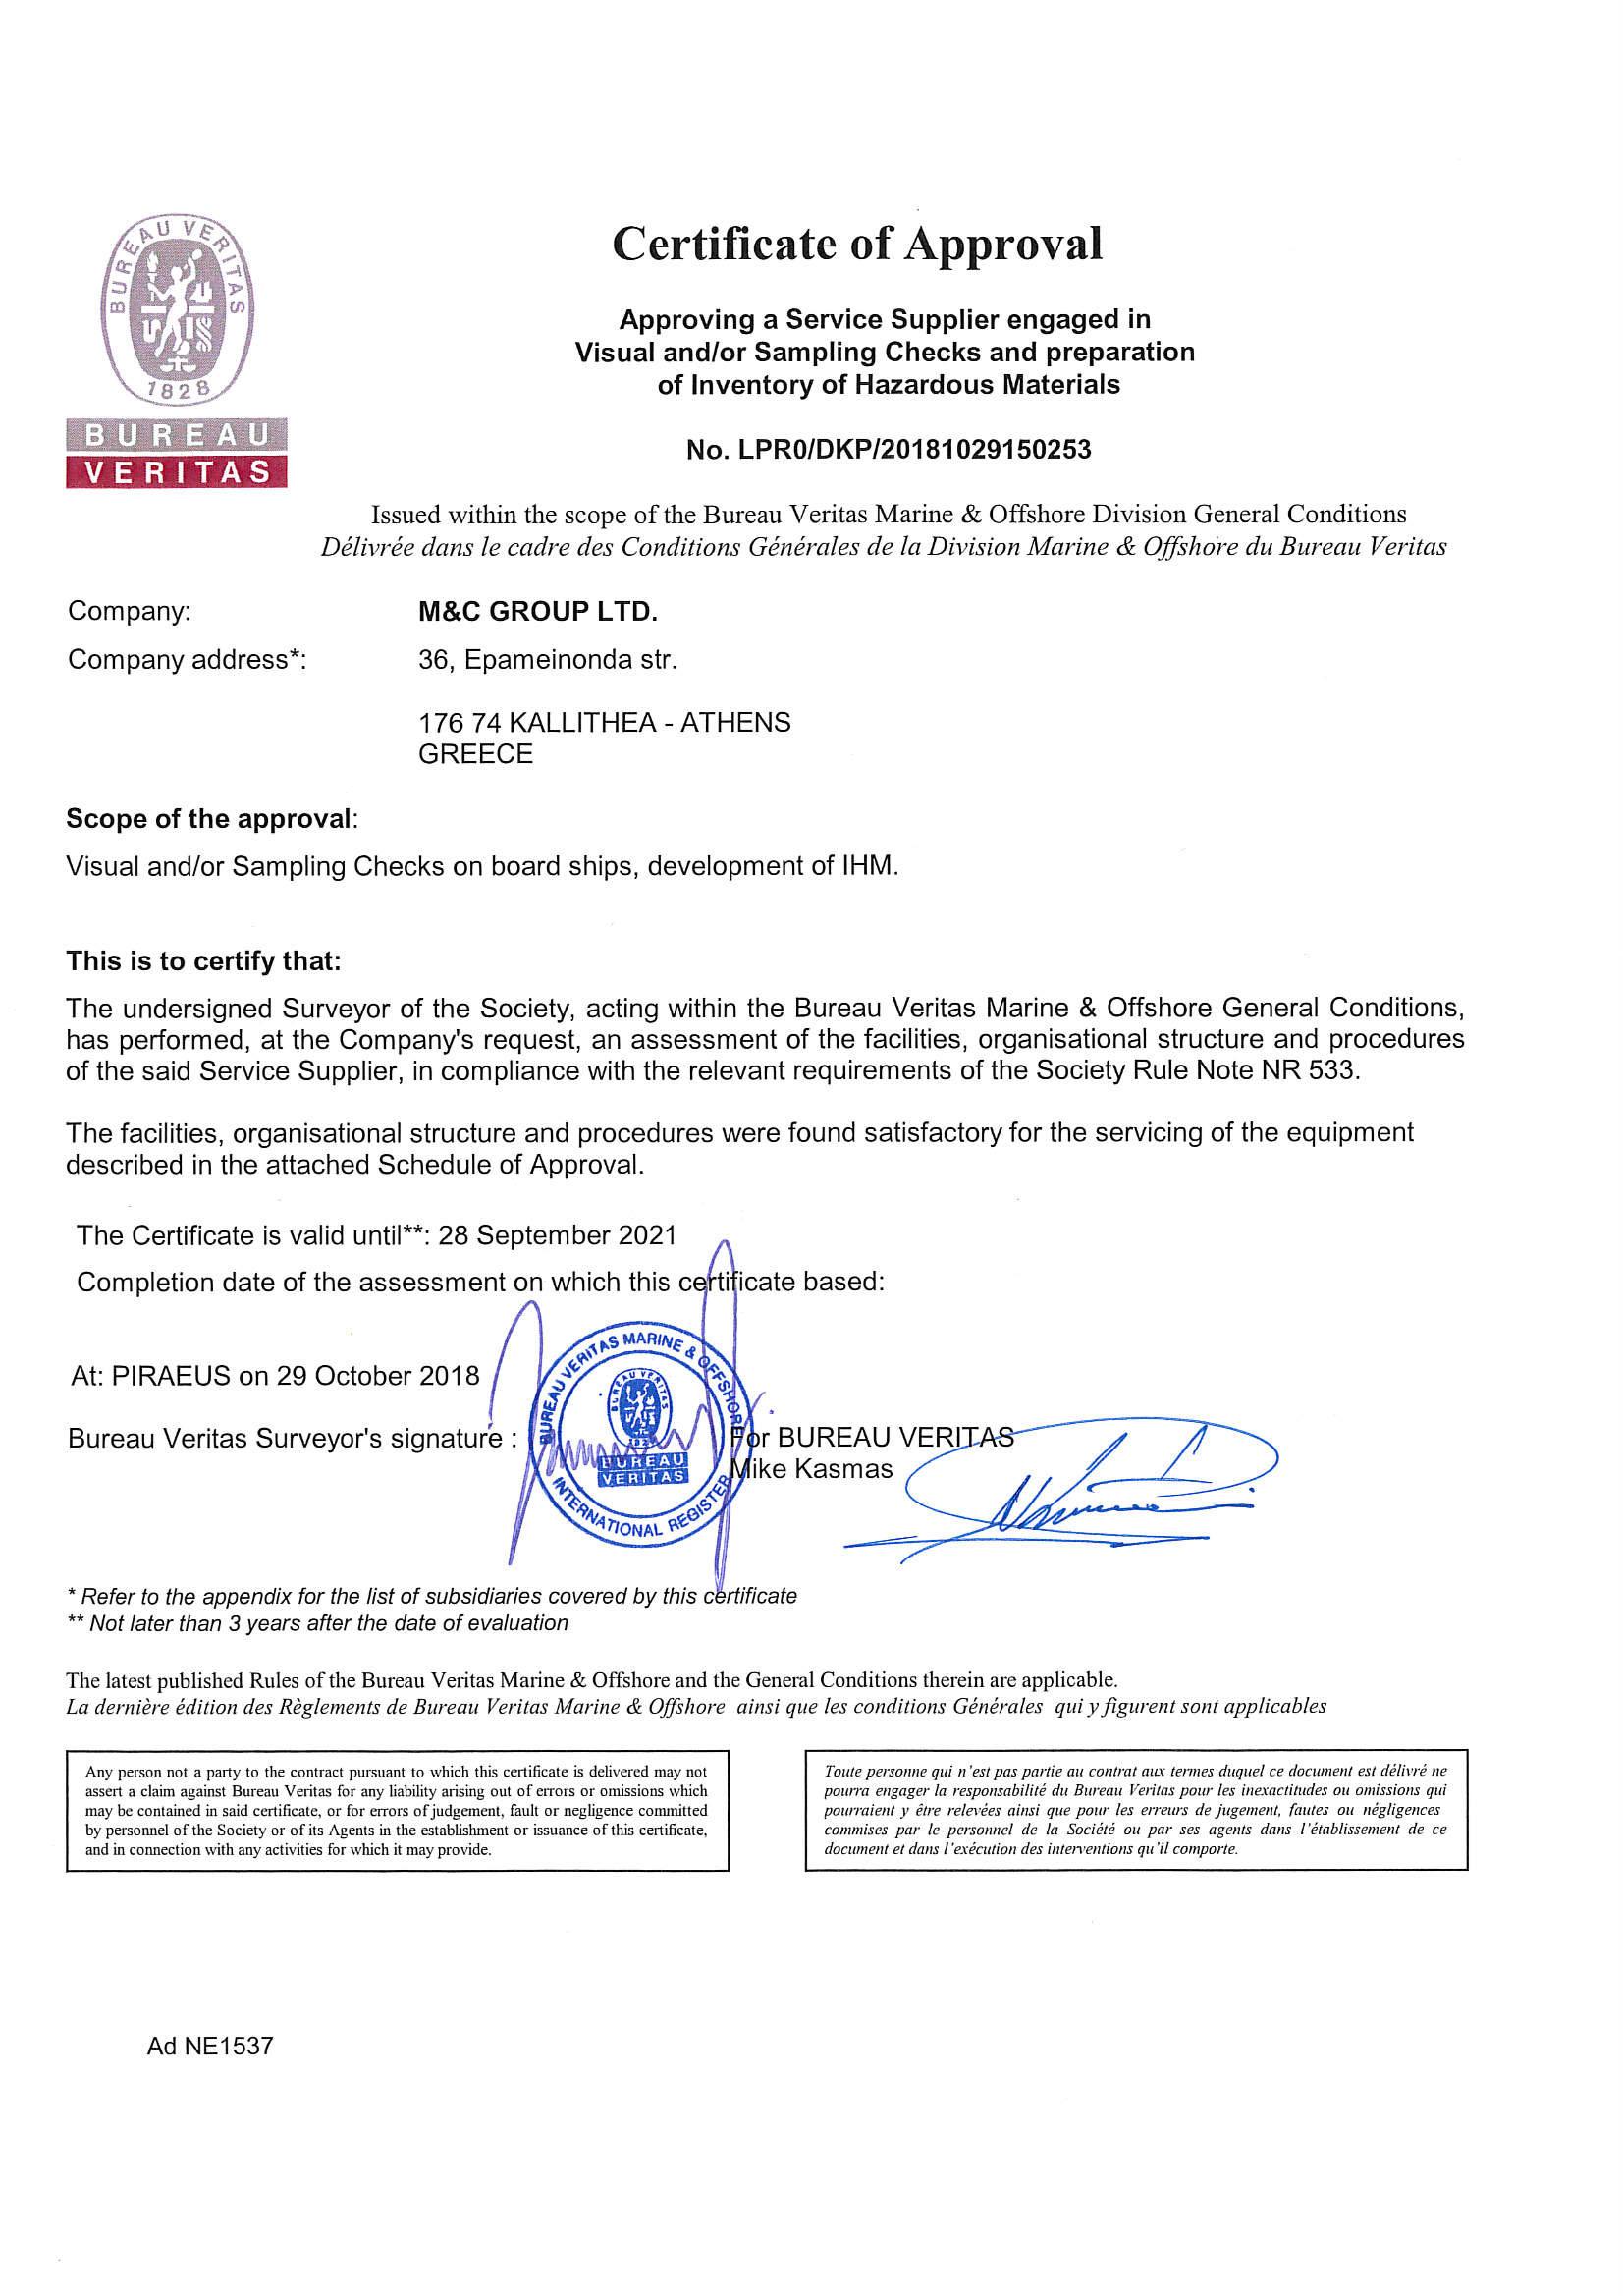 hazardous inventory ihm materials certificate bv compliance certification material